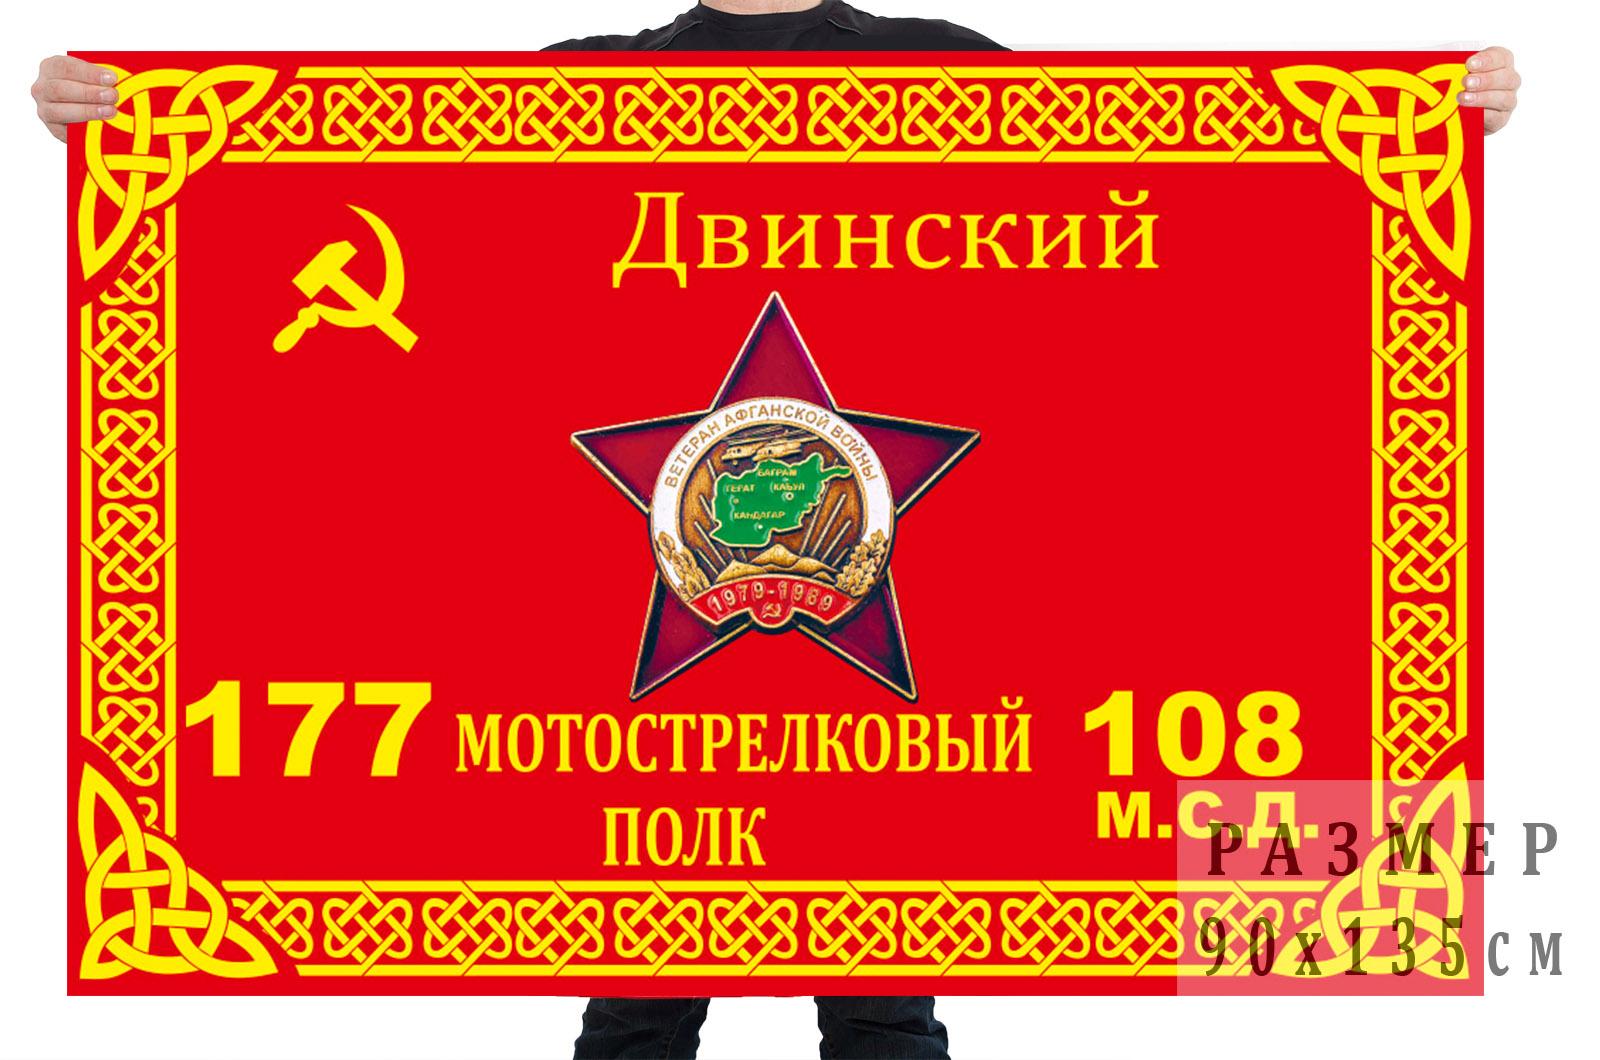 Флаг 177 Двинского мотострелкового полка